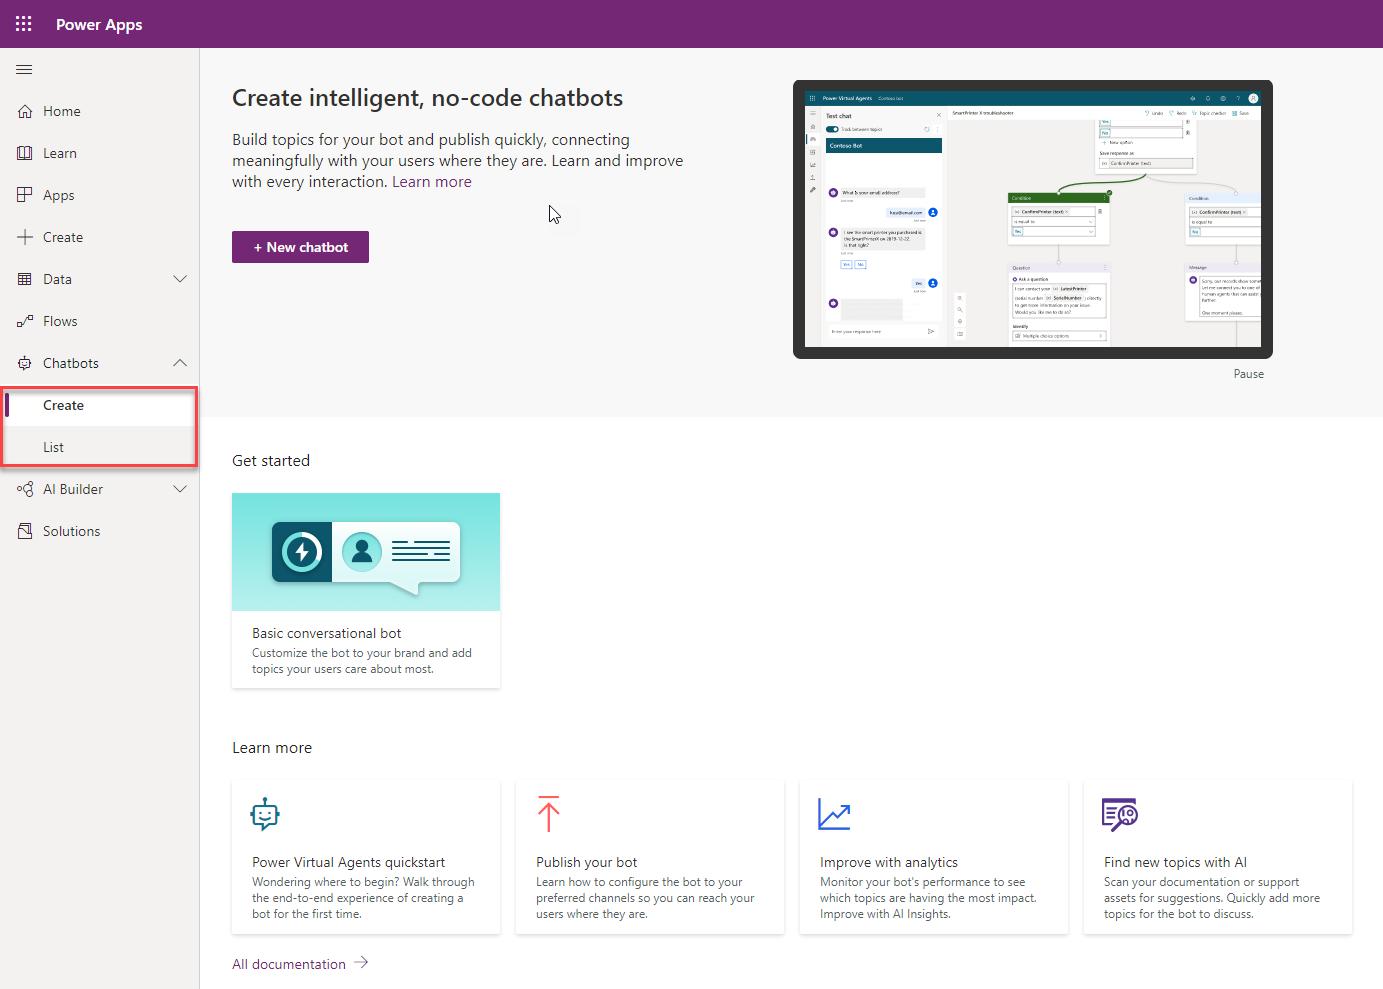 Power Apps Maker Portal June 2020 Updates - Chatbots